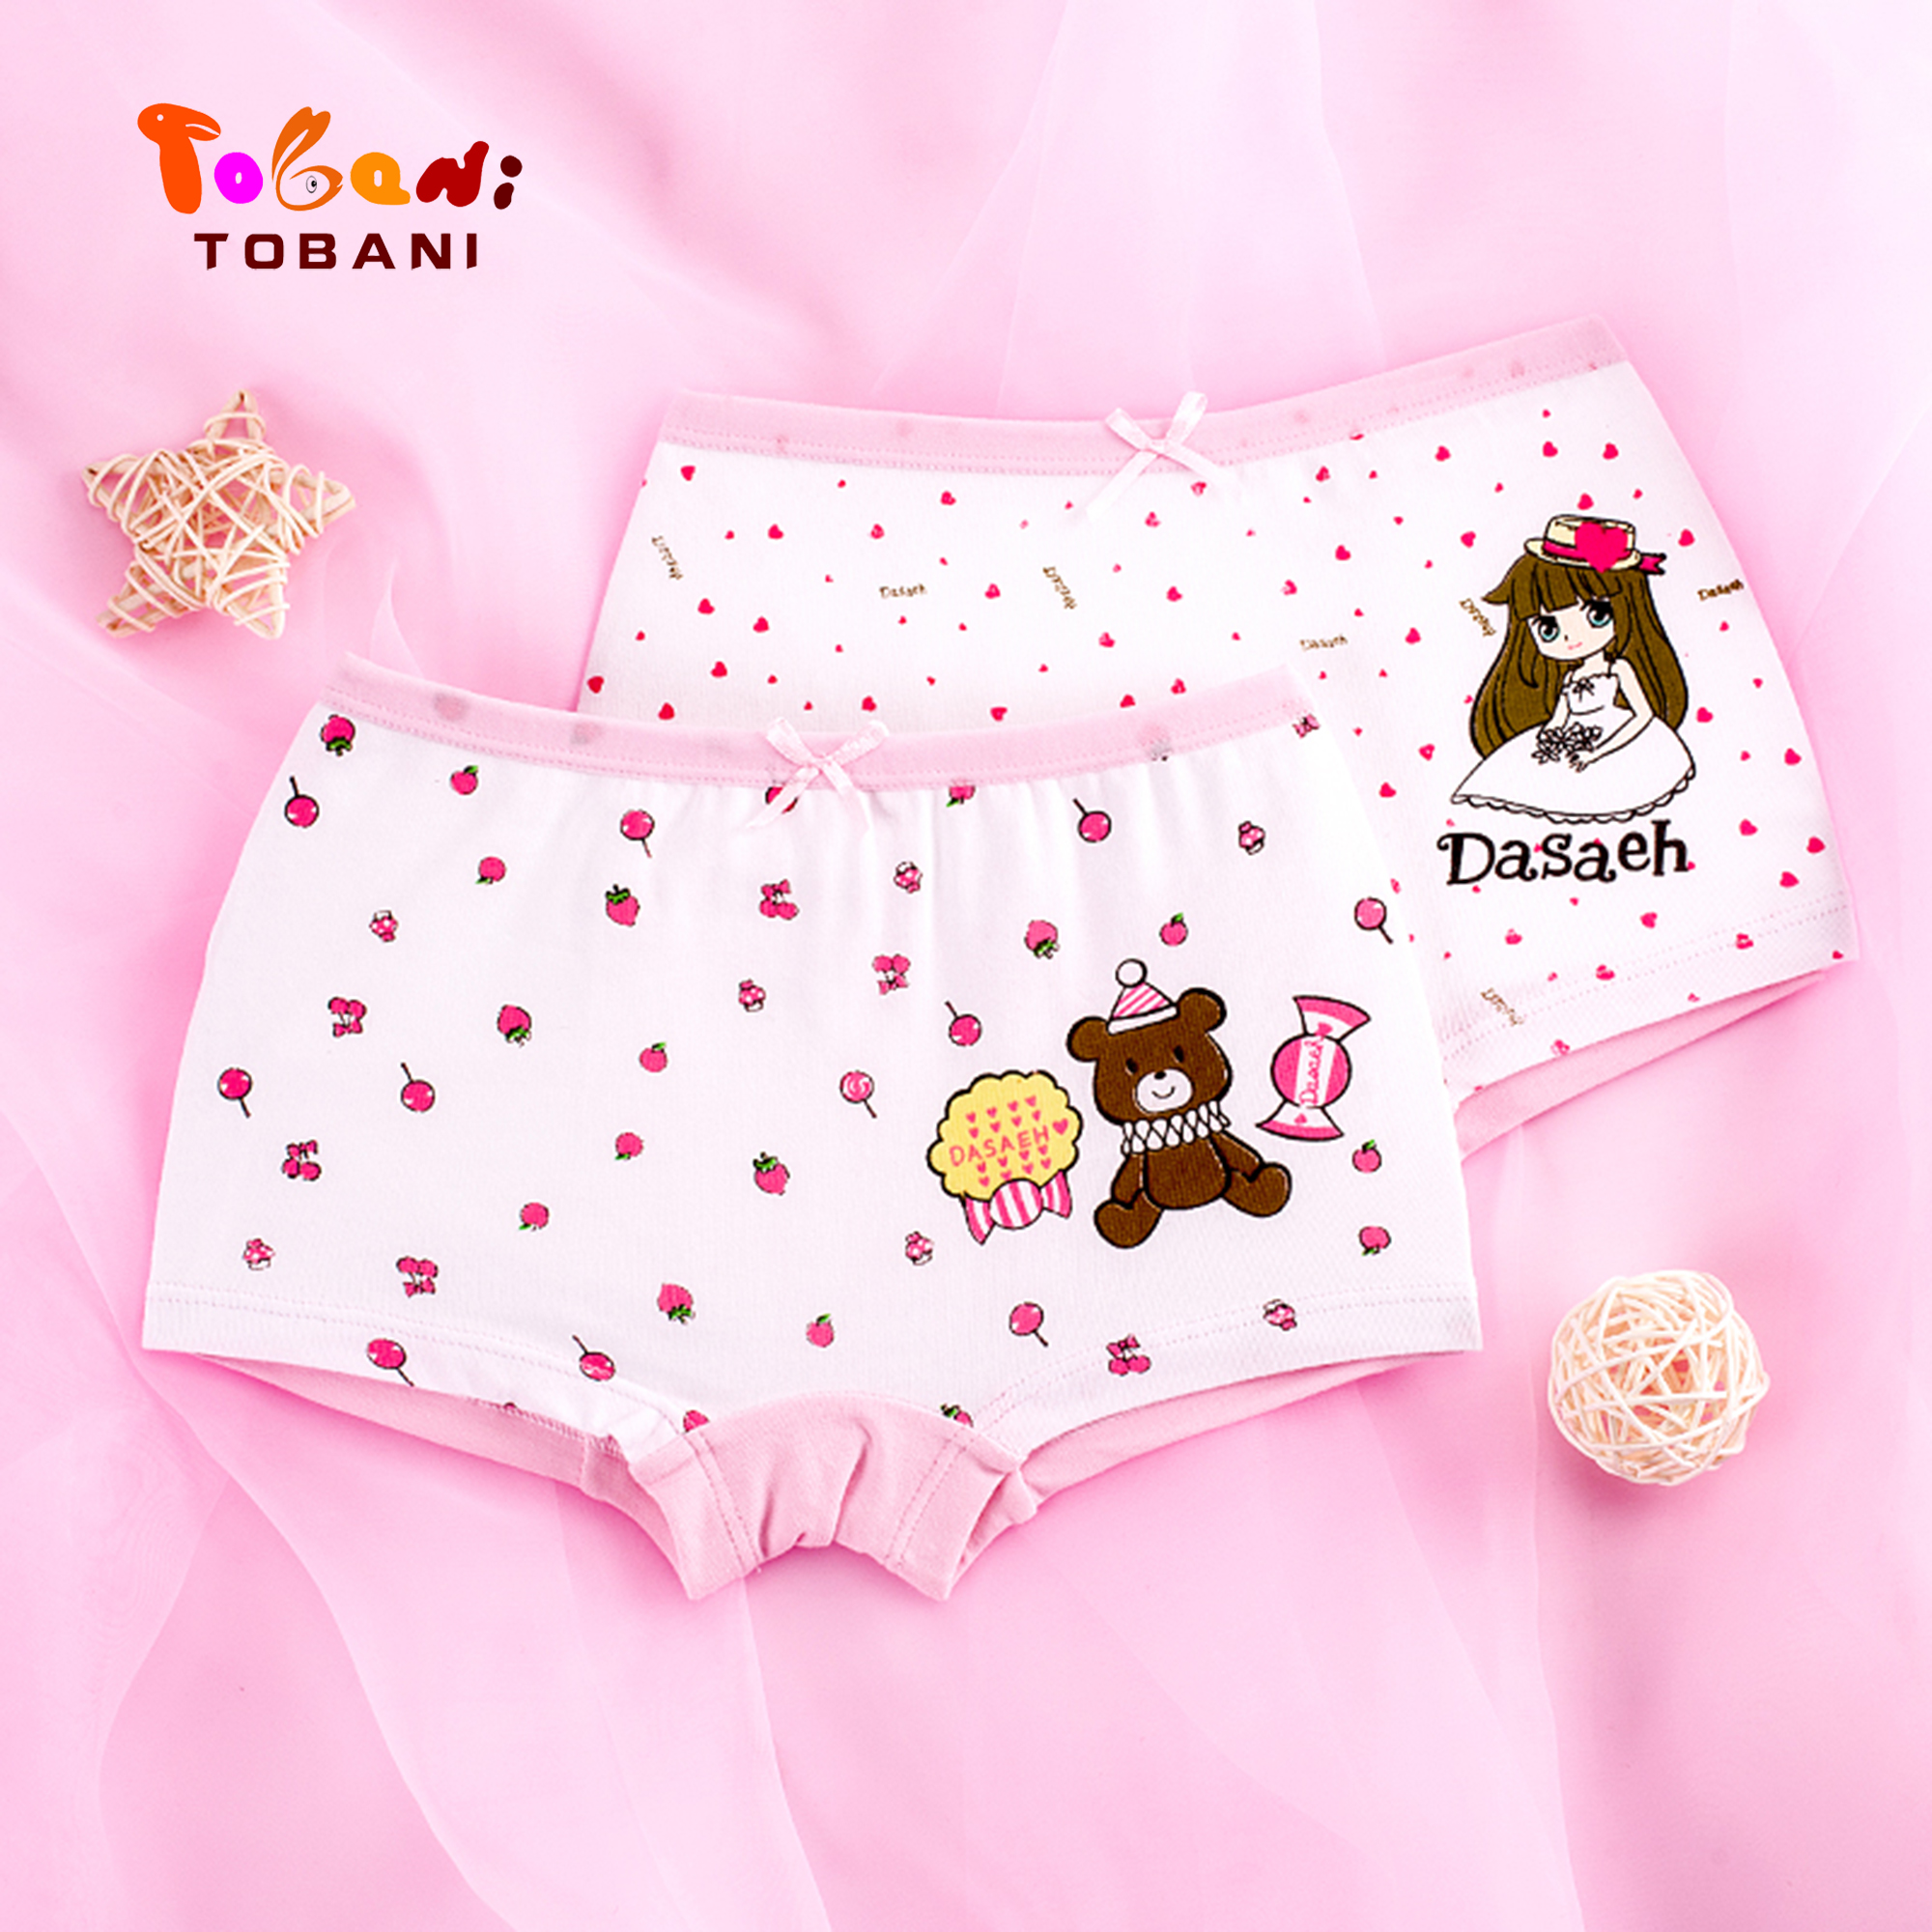 Buy girls underwear large children panties cotton trousers girl student four angle baby shorts Tobani 2pcs